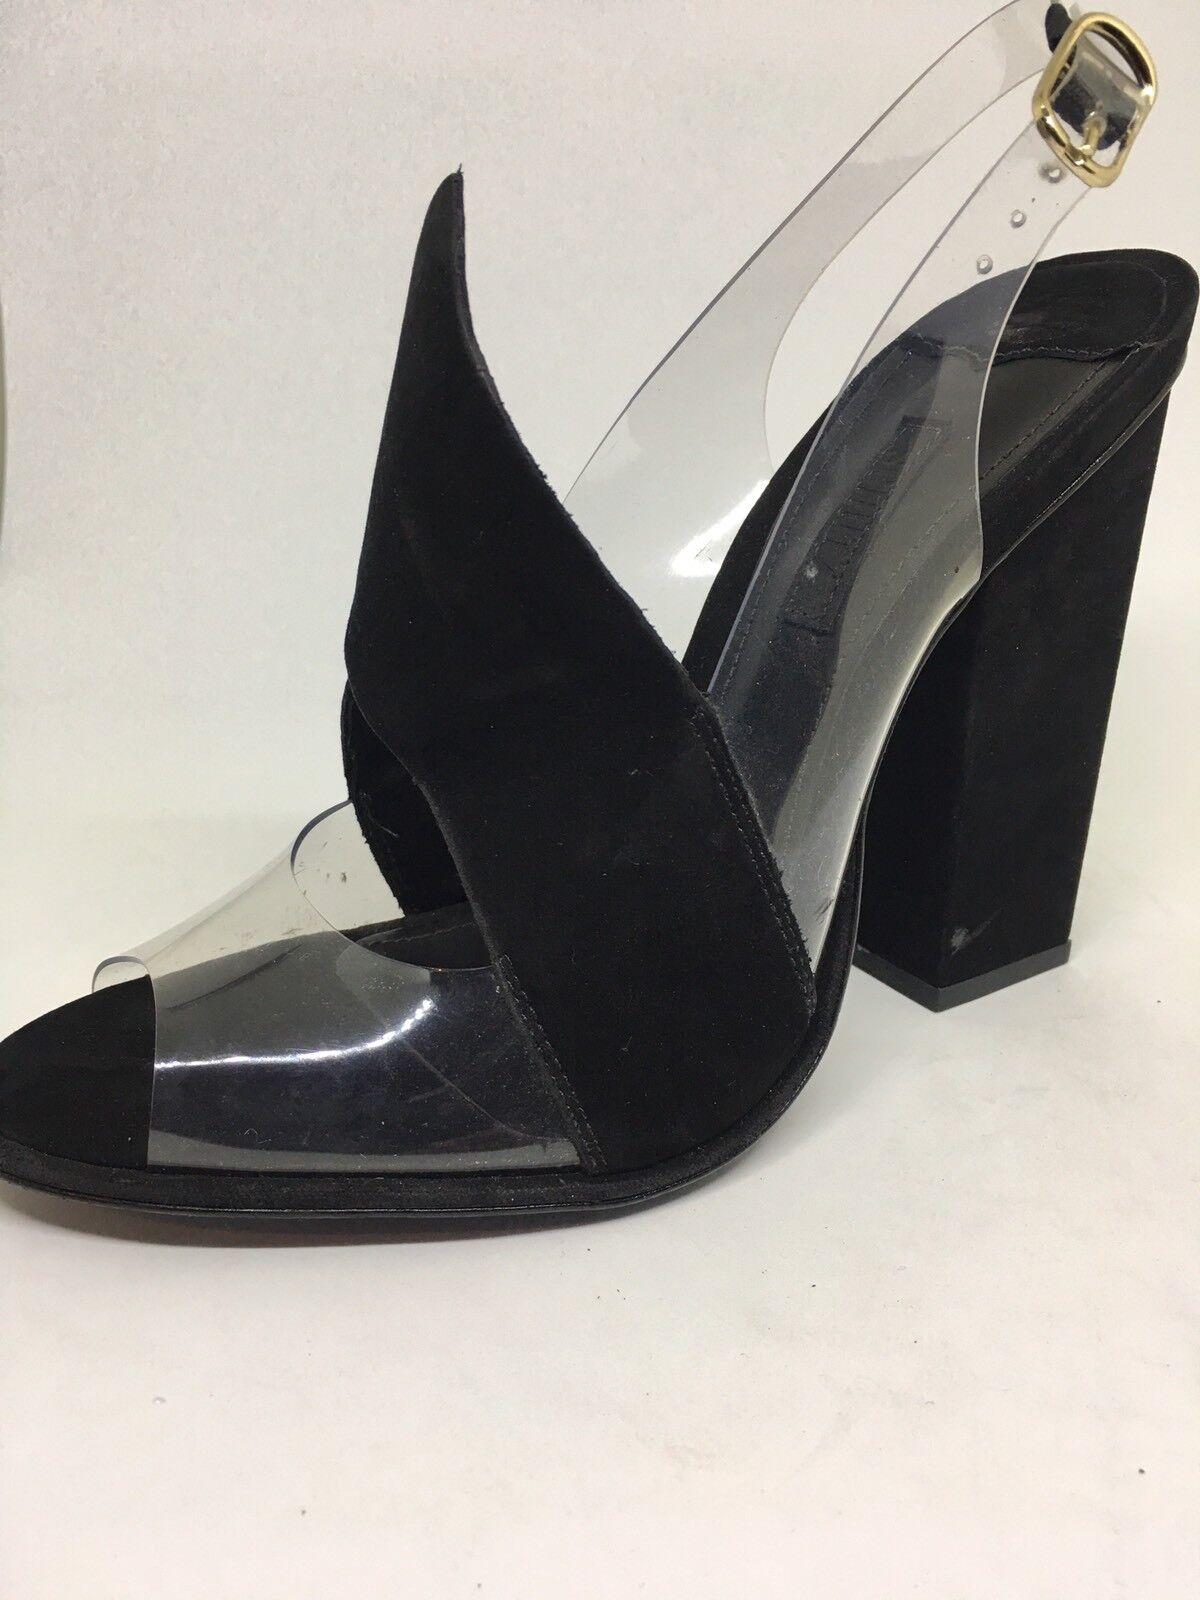 Schultz Sandalia Alto Women's Heeled Sling Back Sandals EU Size 35, UK size 2